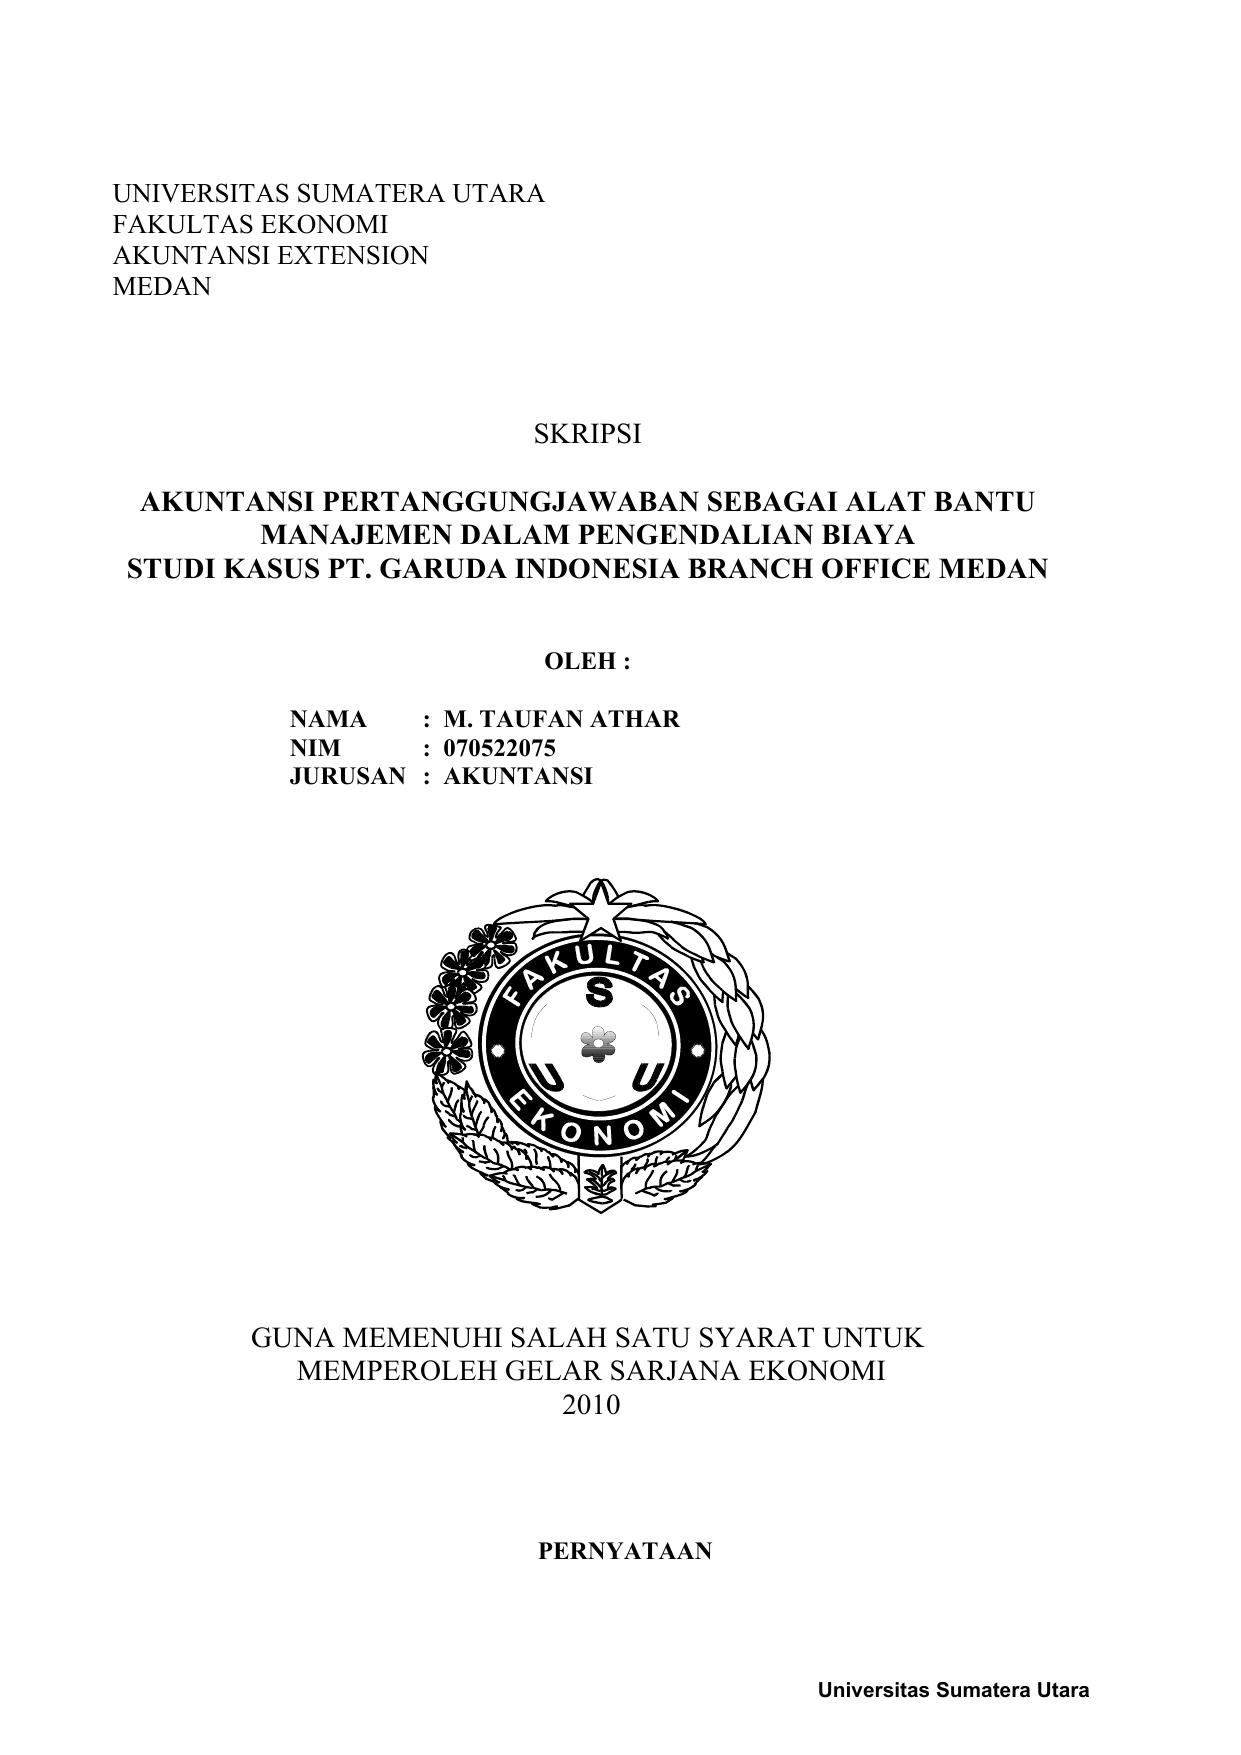 Skripsi Akuntansi Pertanggungjawaban Sebagai Alat